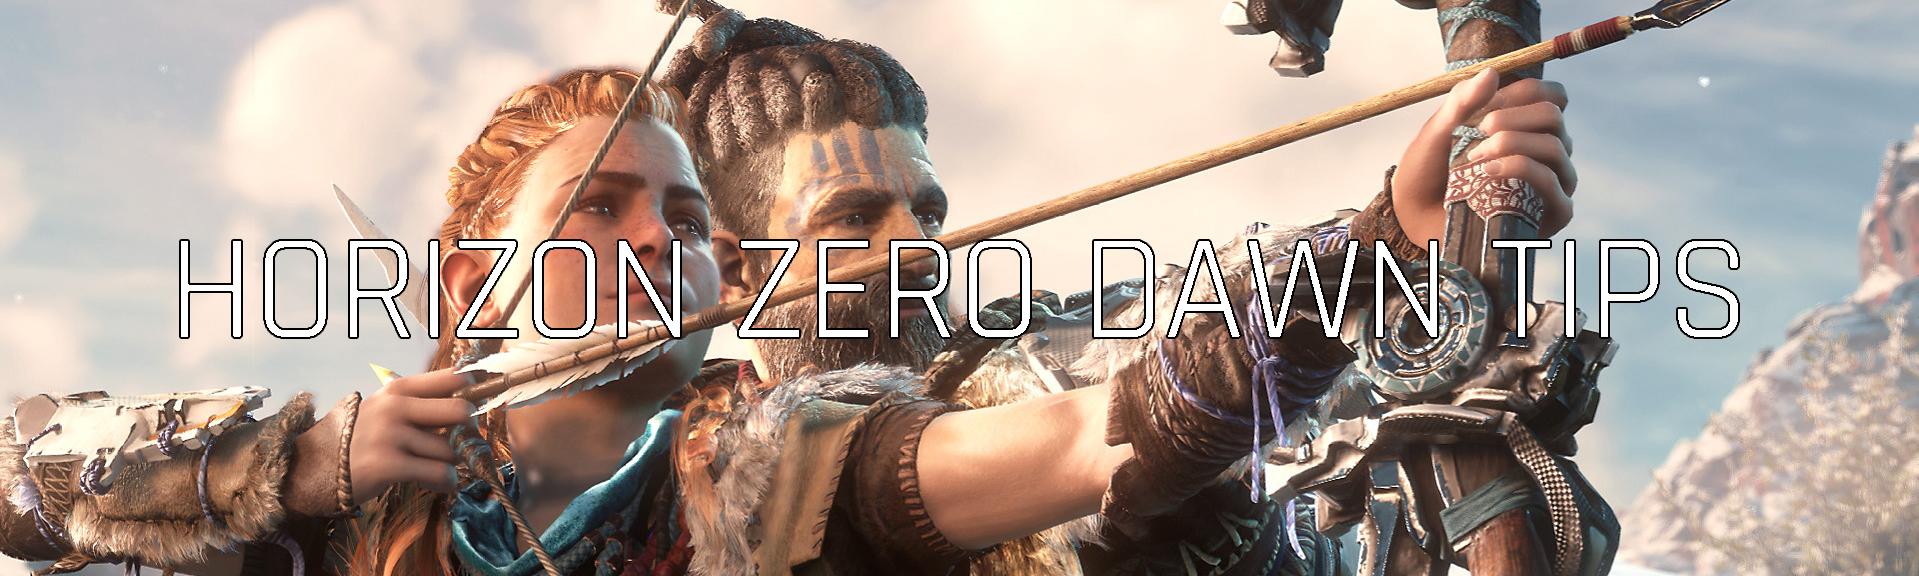 Horizon Zero Dawn tips